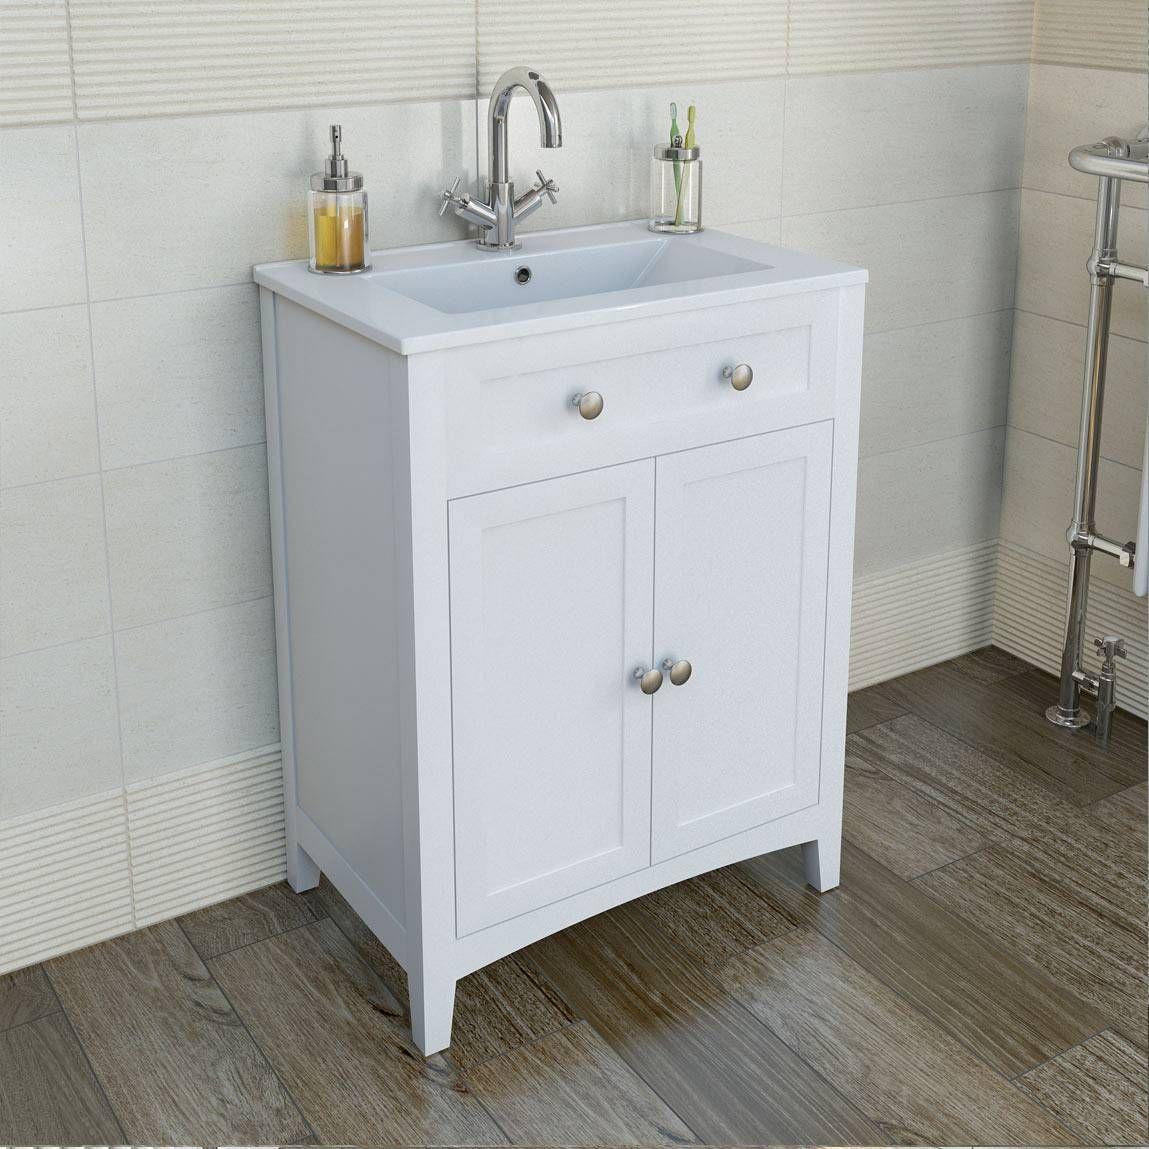 Camberley White 600 Door Unit Basin Http Www Victoriaplumb Bathroom Furniture Vanity Units 1720 Html